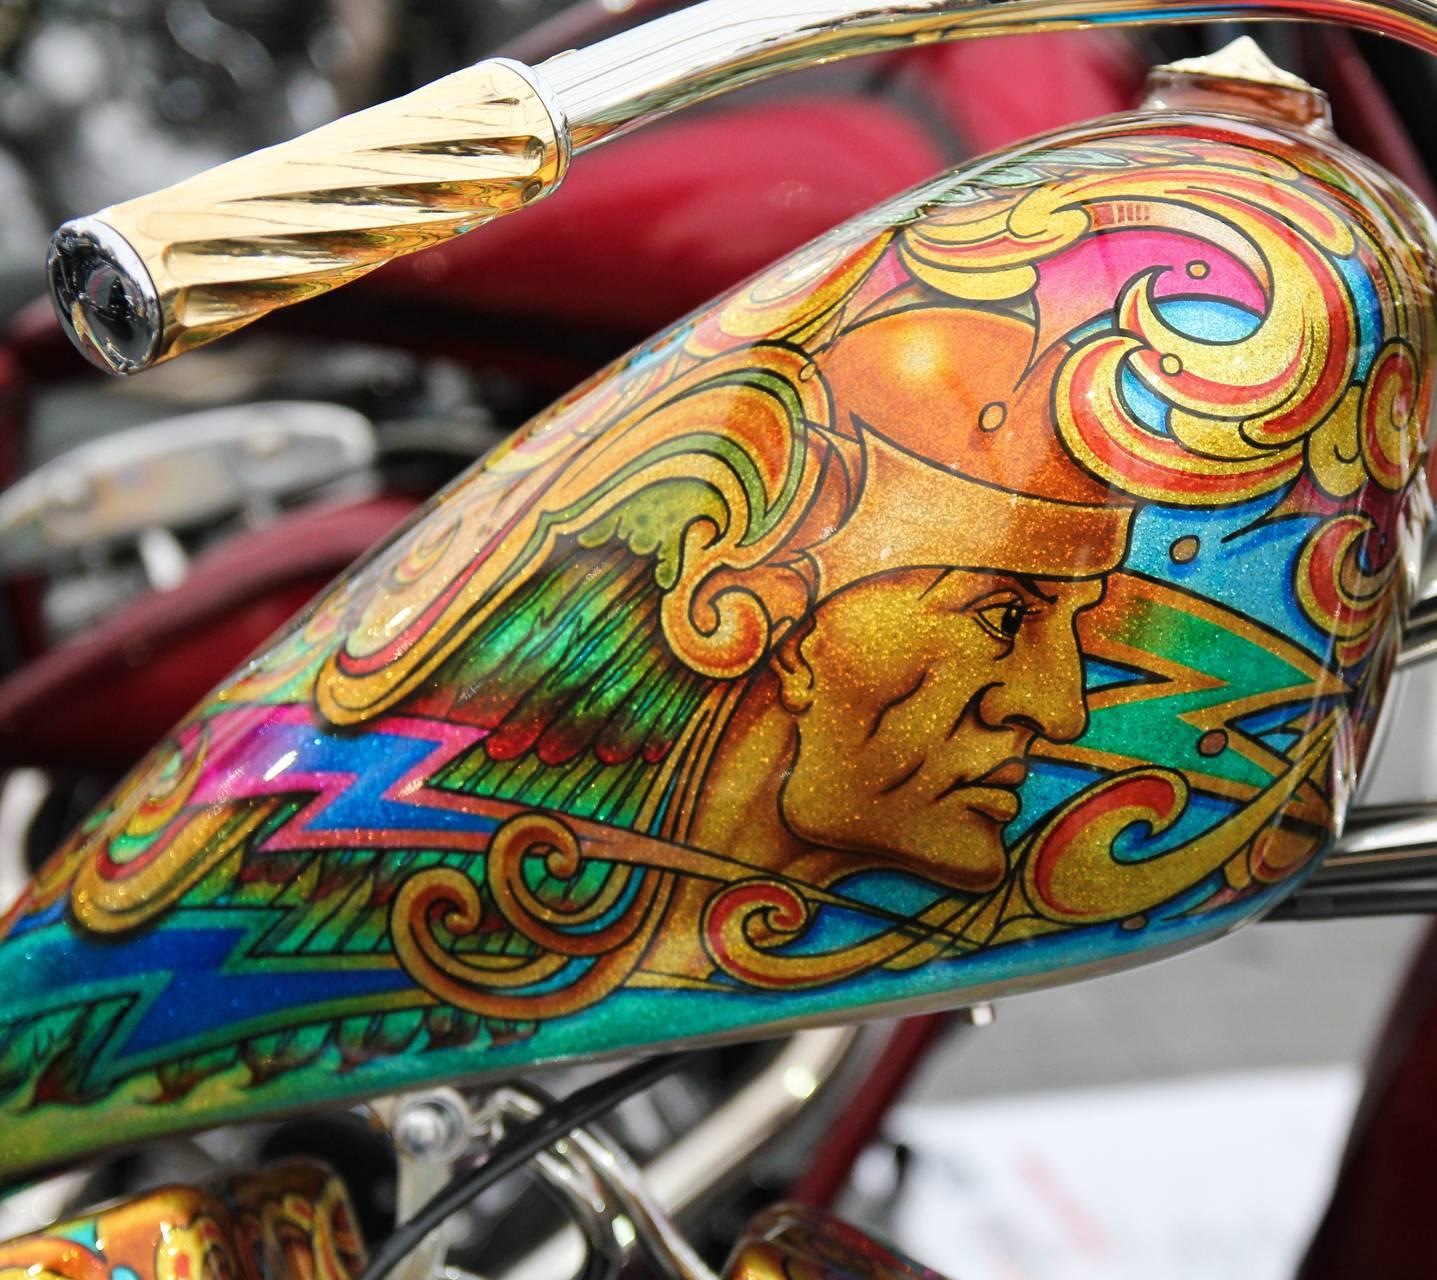 A Harley 9